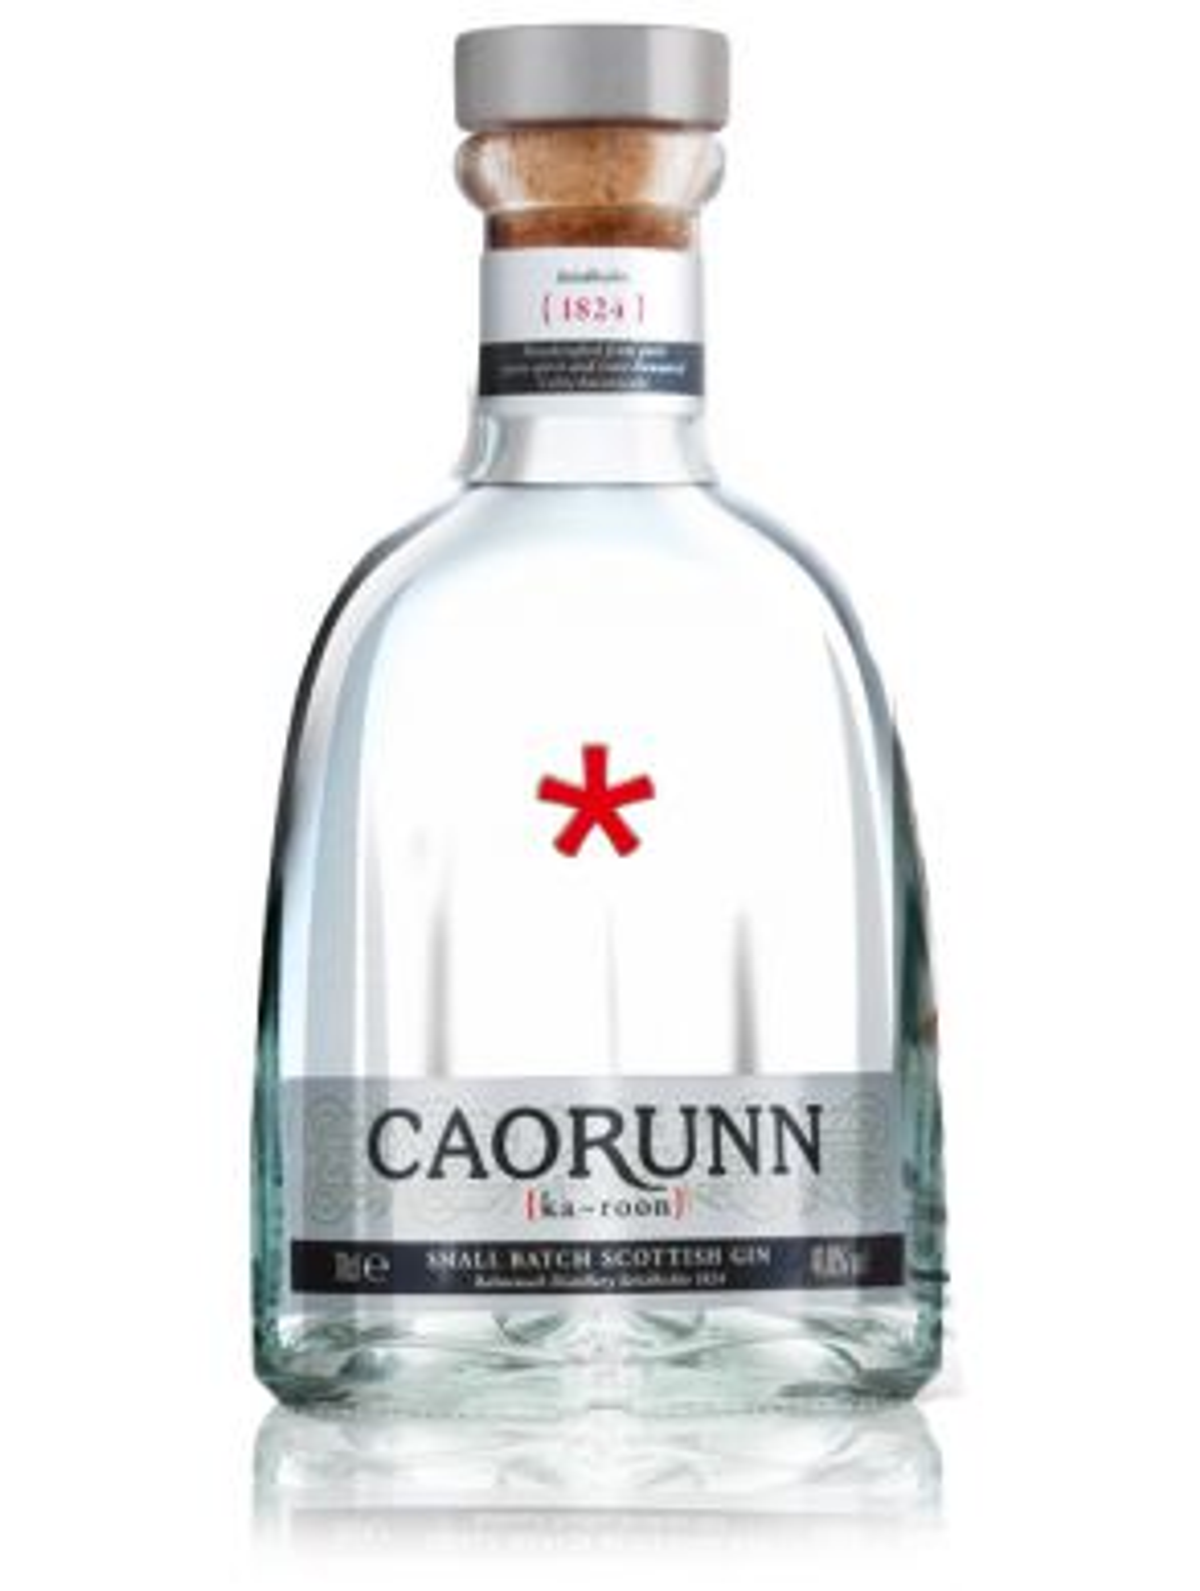 Caorunn Small Batch Scottish Gin 70cl